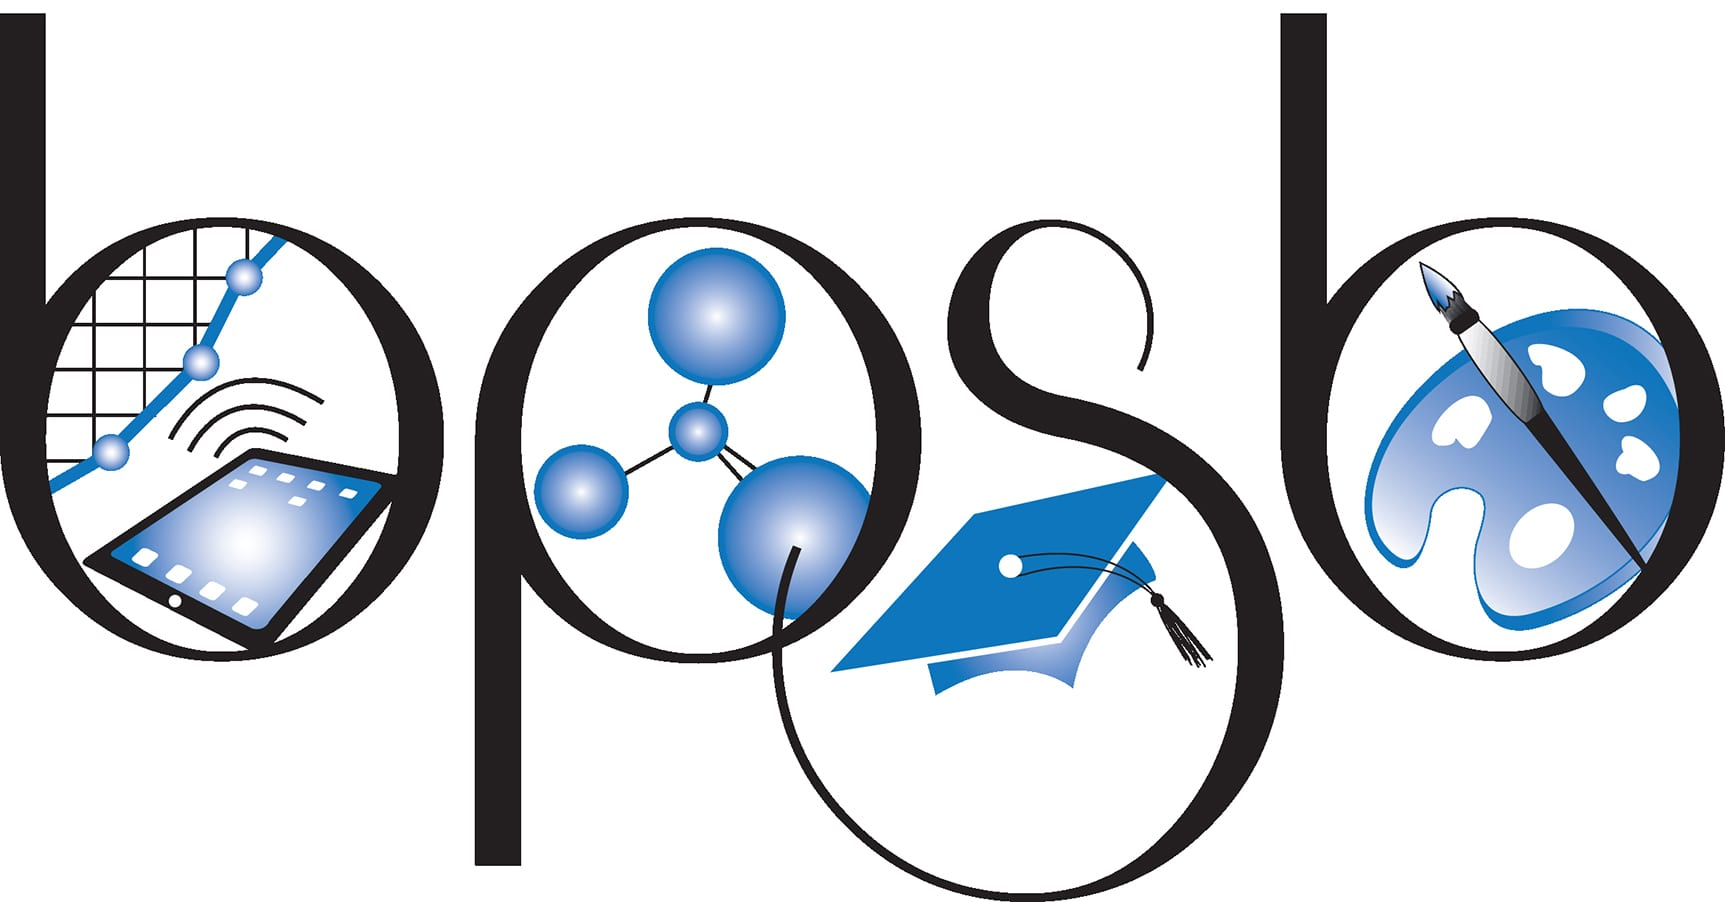 School Year To Start Early In 2017-2018 – Bossier Press-Tribune pertaining to Bossier Parrish School Calendar